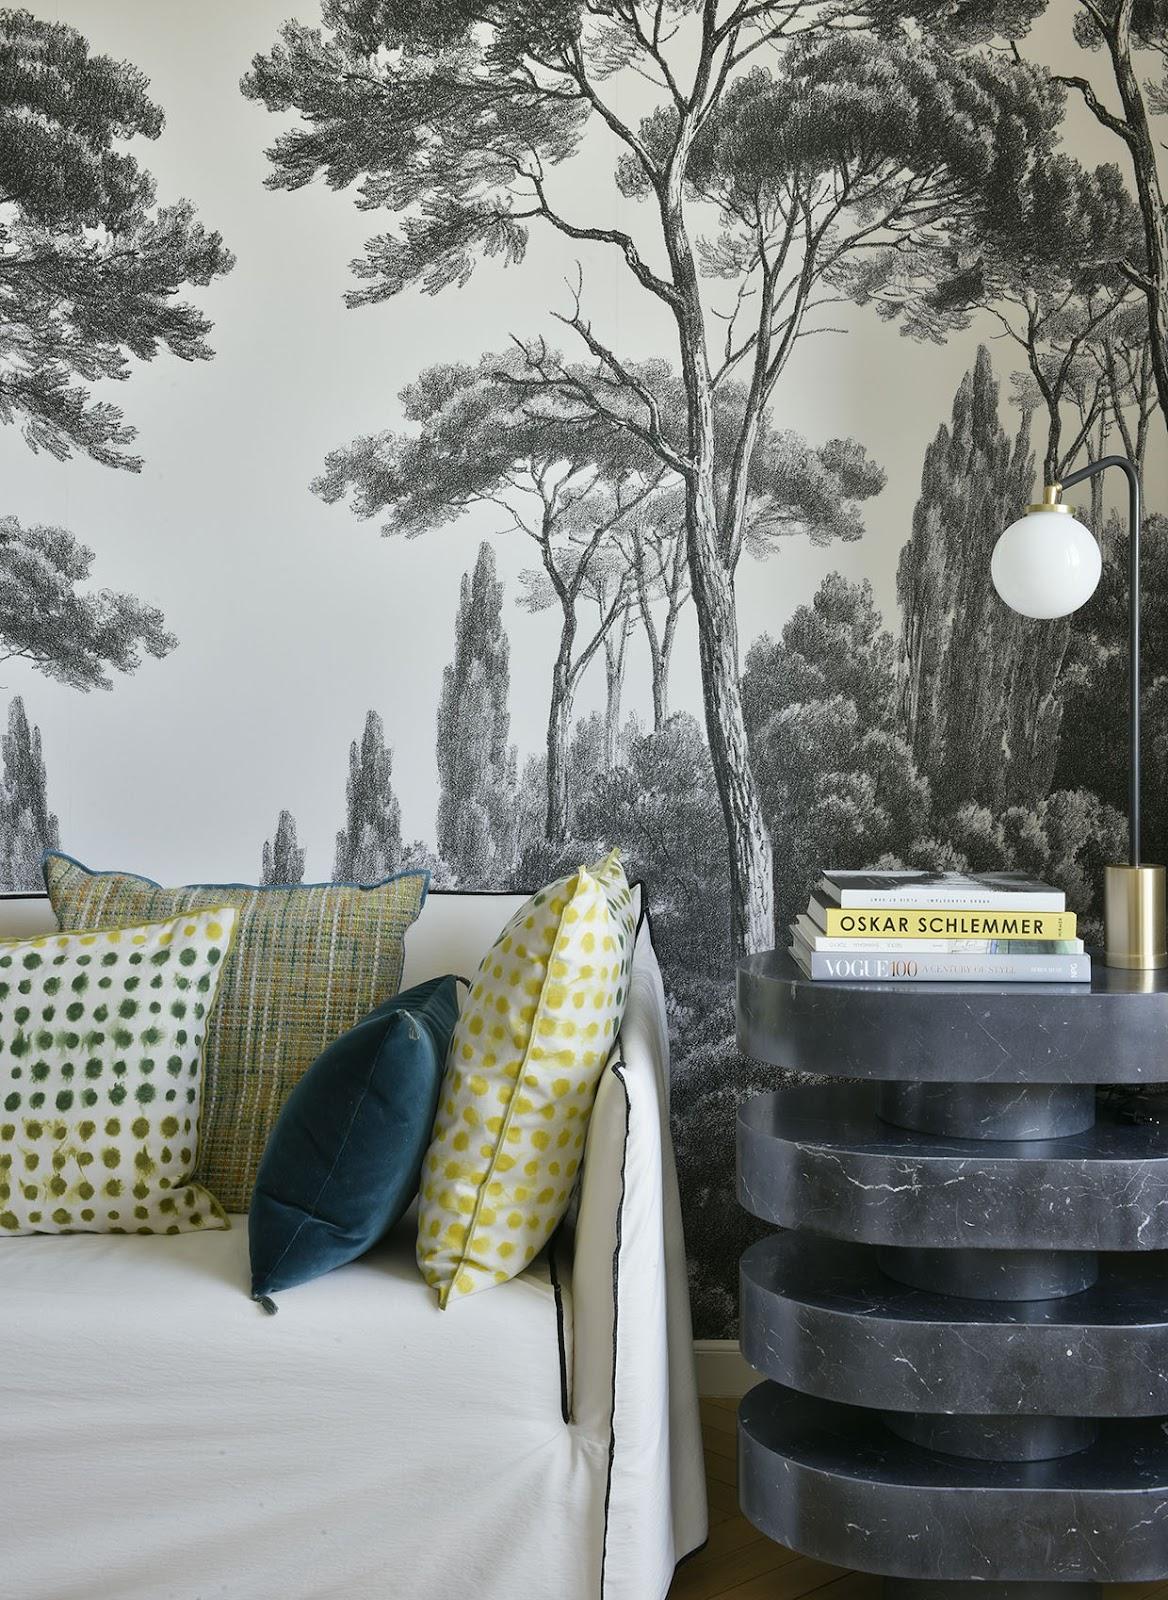 Motif wallpaper pada hunian bergaya art deco - source: gaspardronjat.com